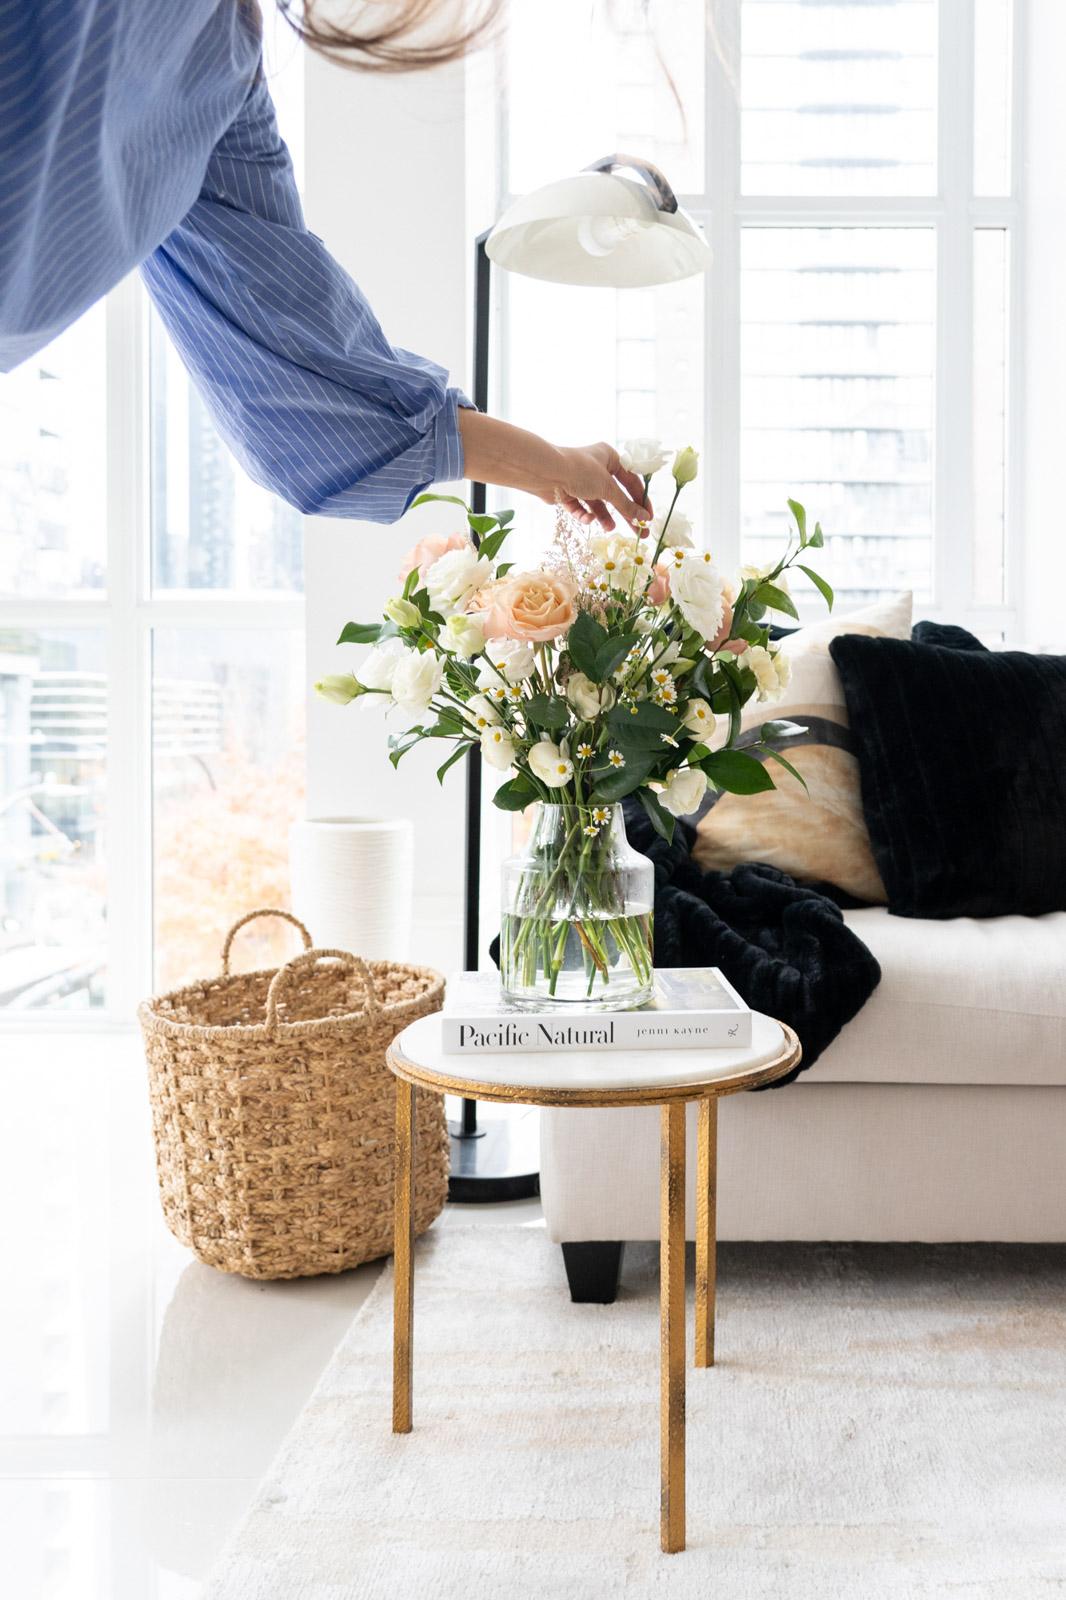 Bloomiér Vancouver sustainable florist